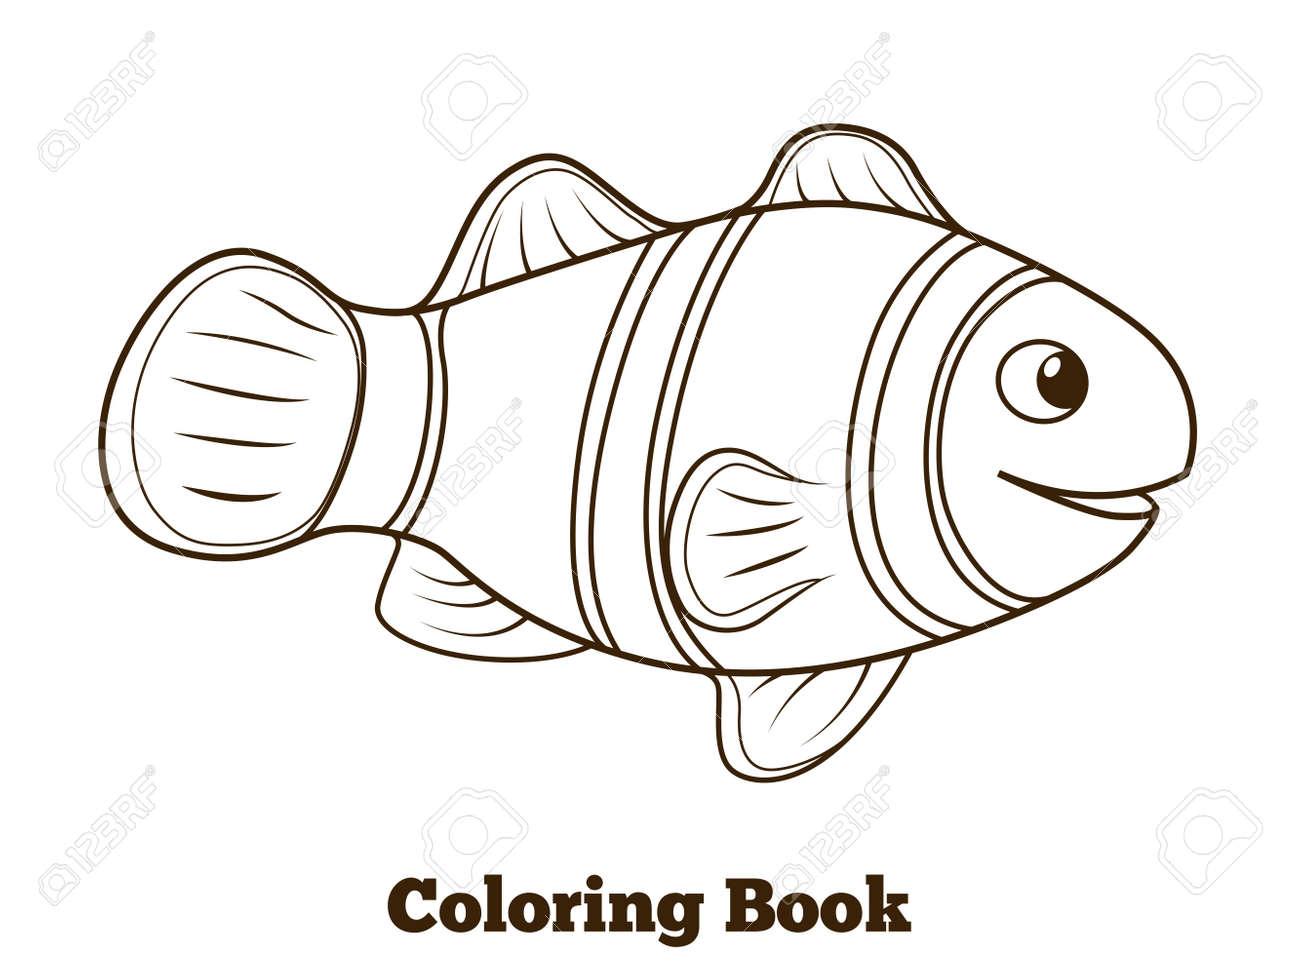 Coloring Book Clownfish Fish Cartoon Colorful Vector Educational